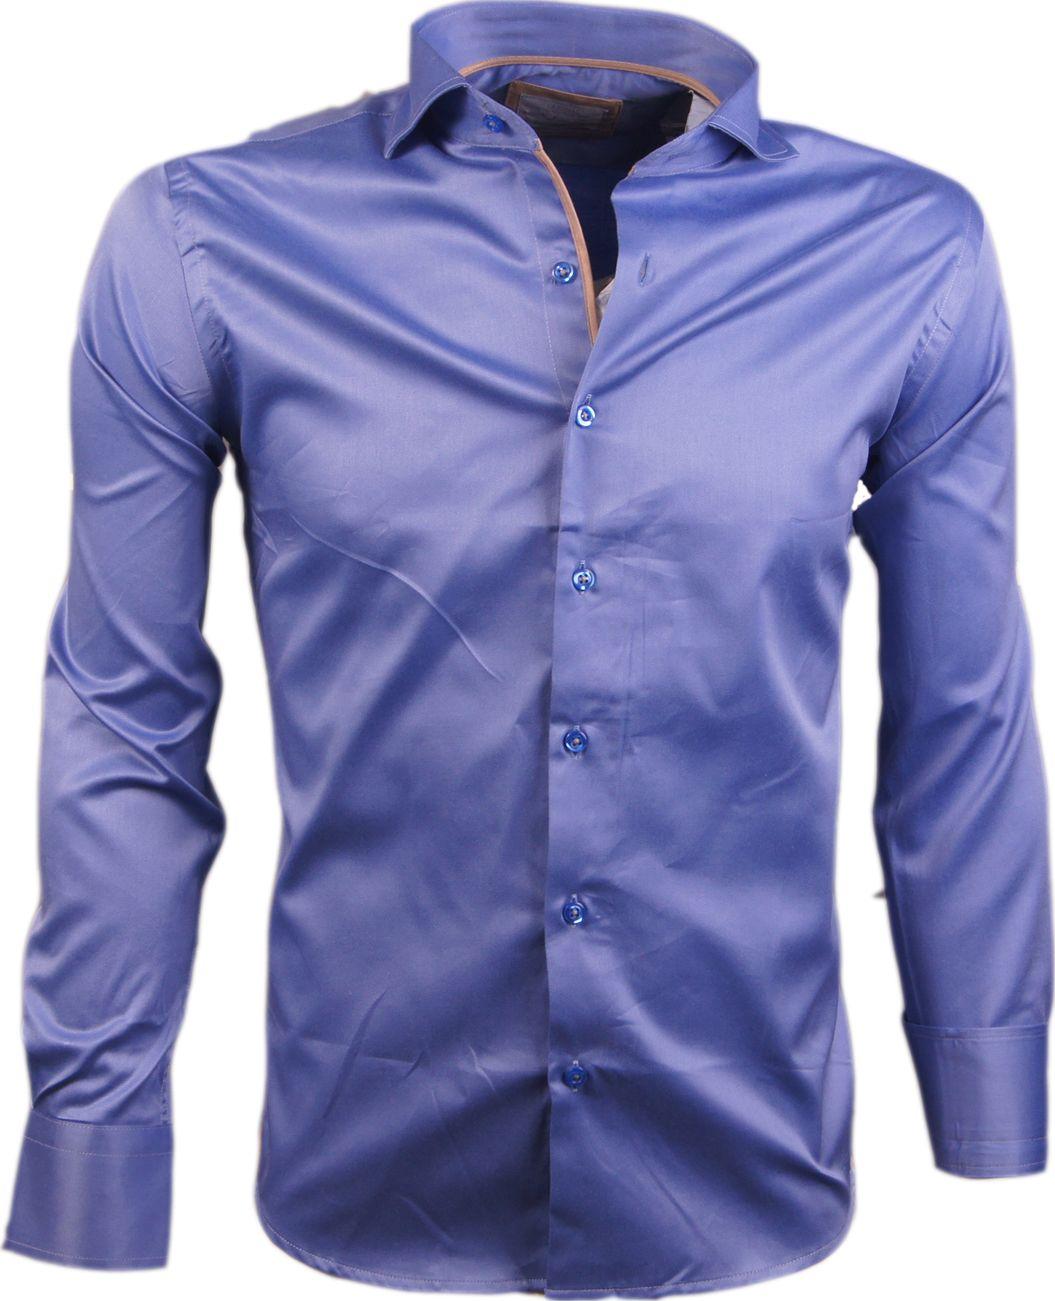 Arya Boy Overhemd.Wam Denim Heren Overhemd Blauw H2557 Menswear For You